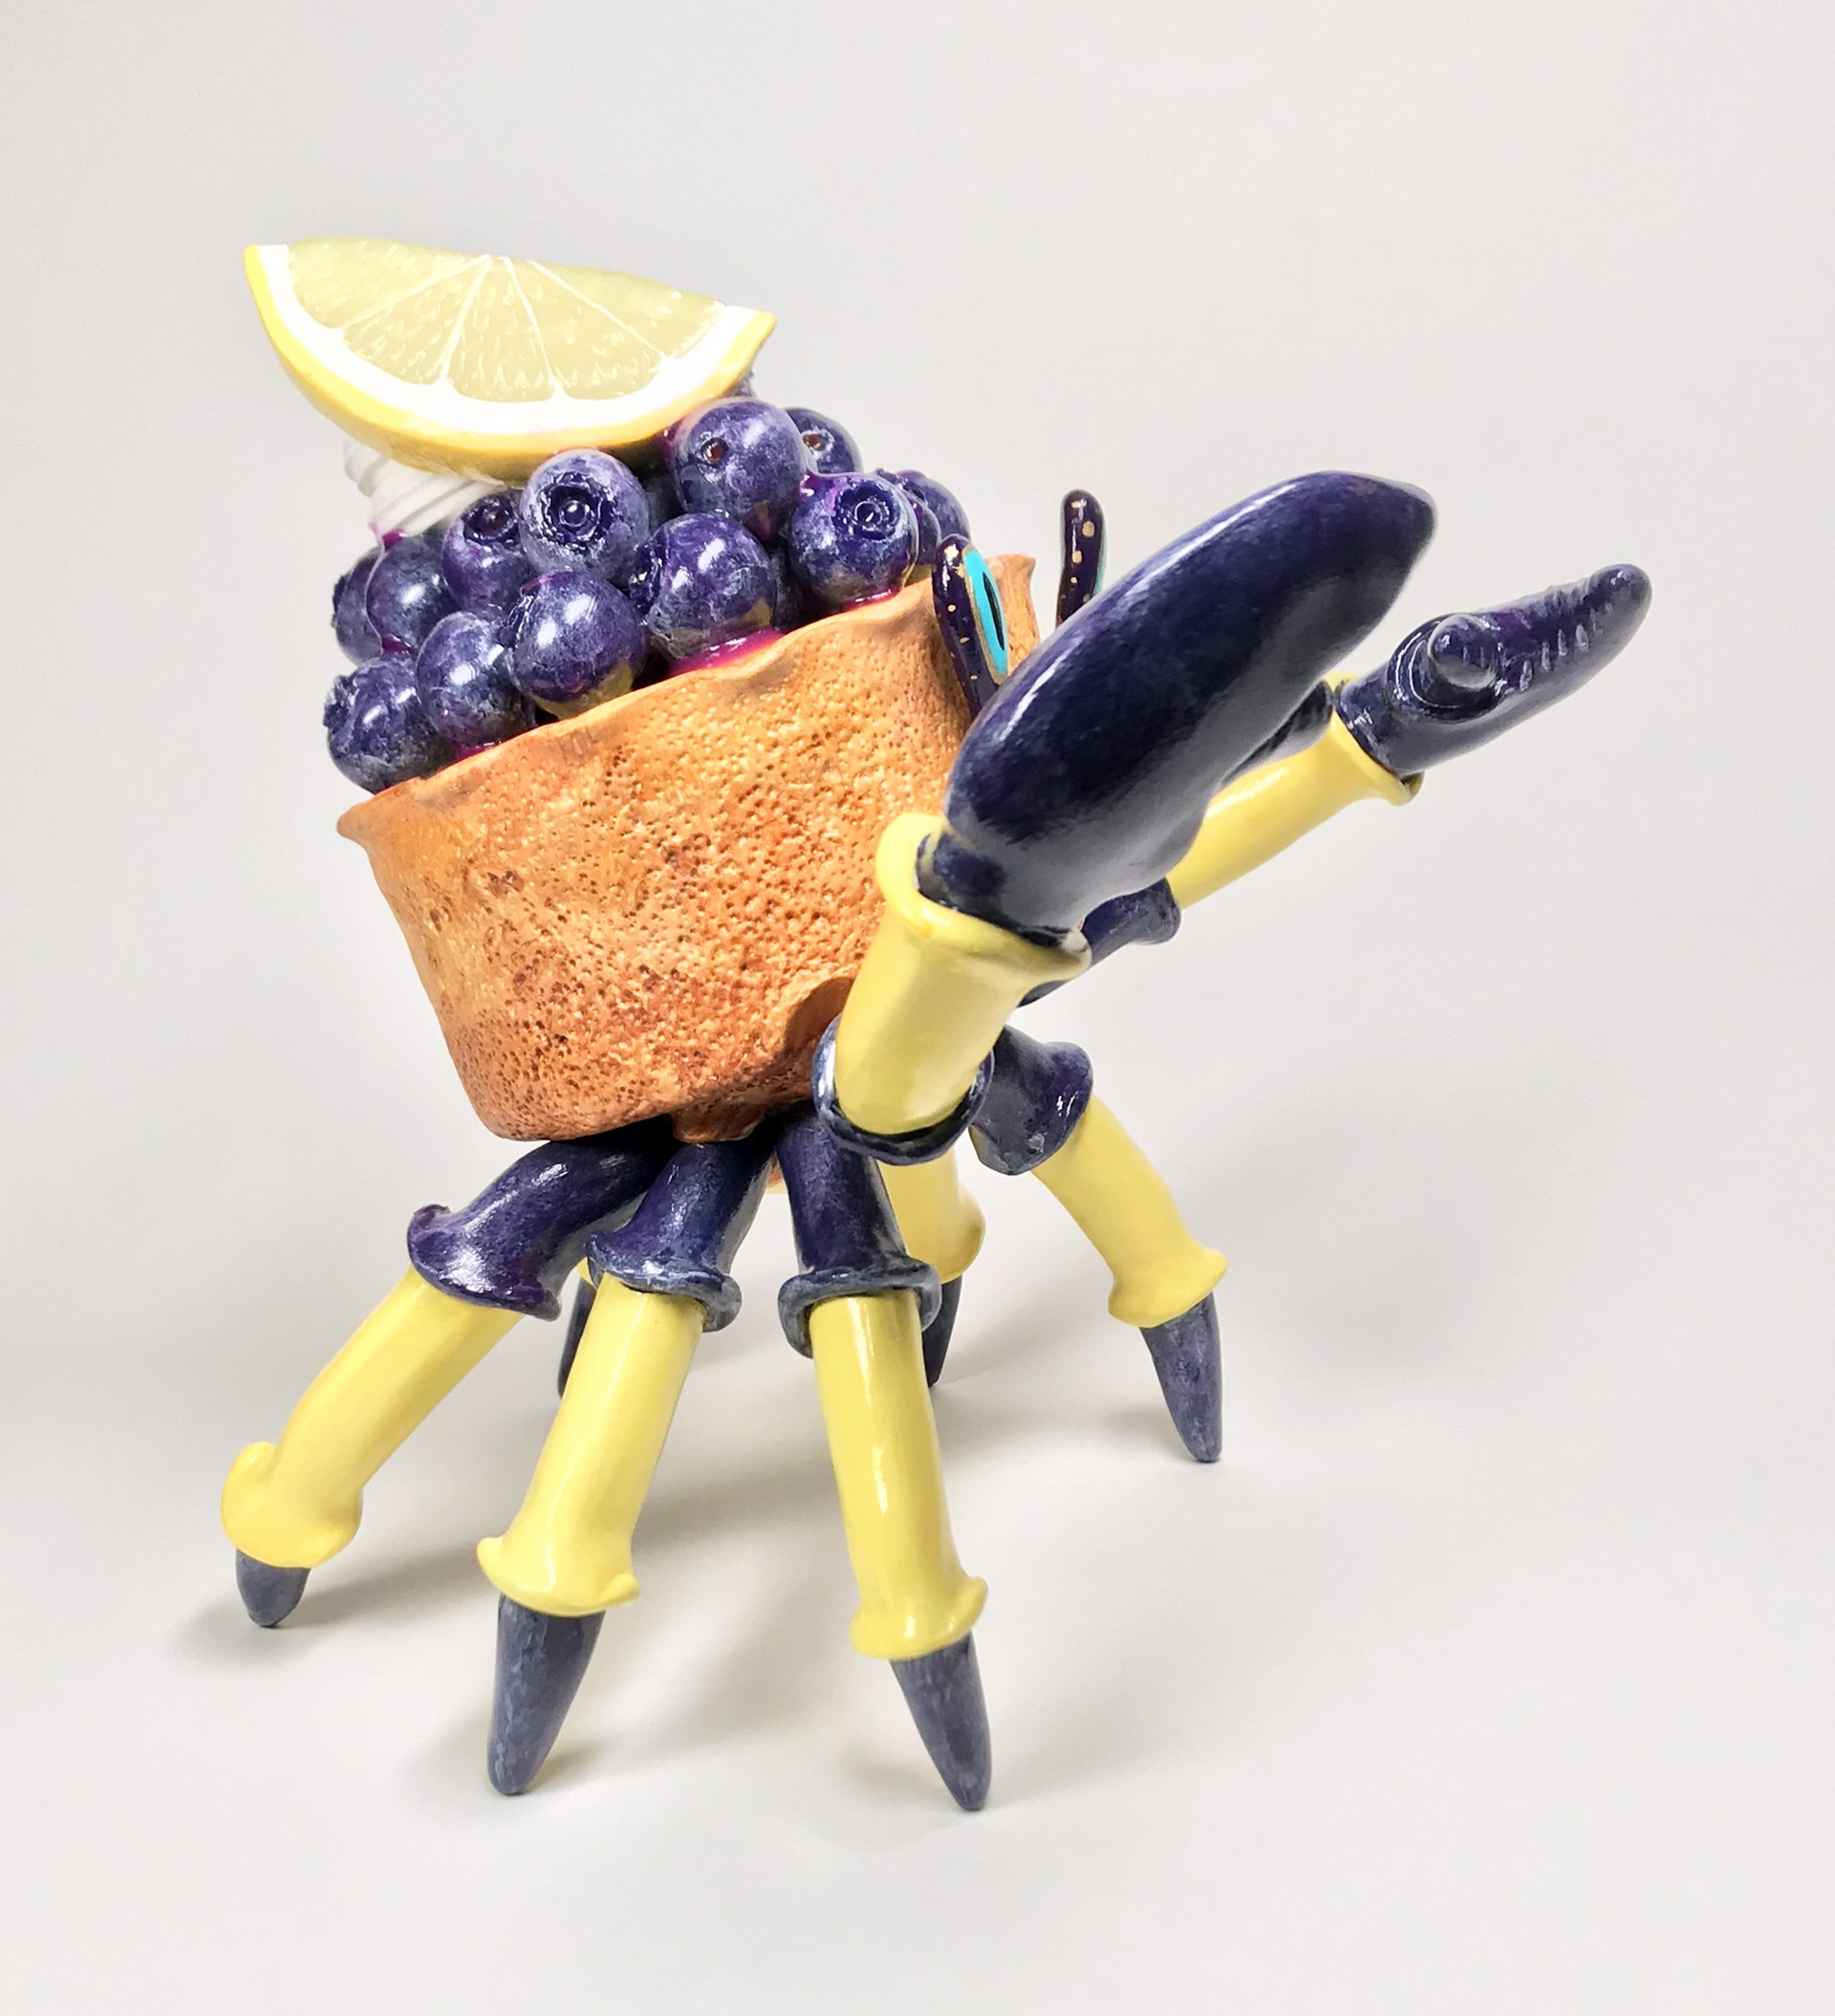 Blueberry Lemon Tart Flavored Crabcake by Corina St. Martin